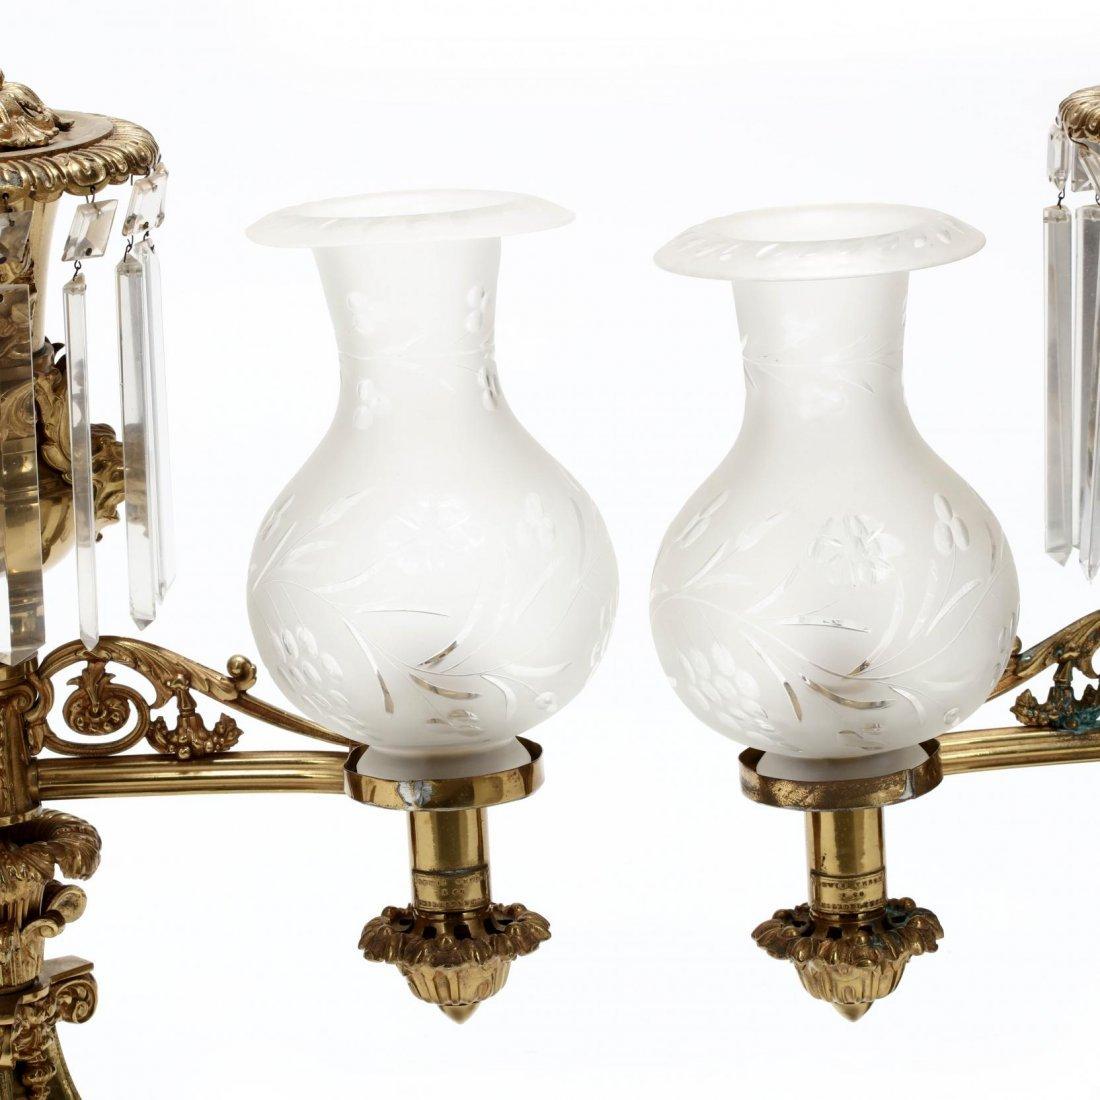 Lewis Veron & Co., Pair of Argand Lamps - 3